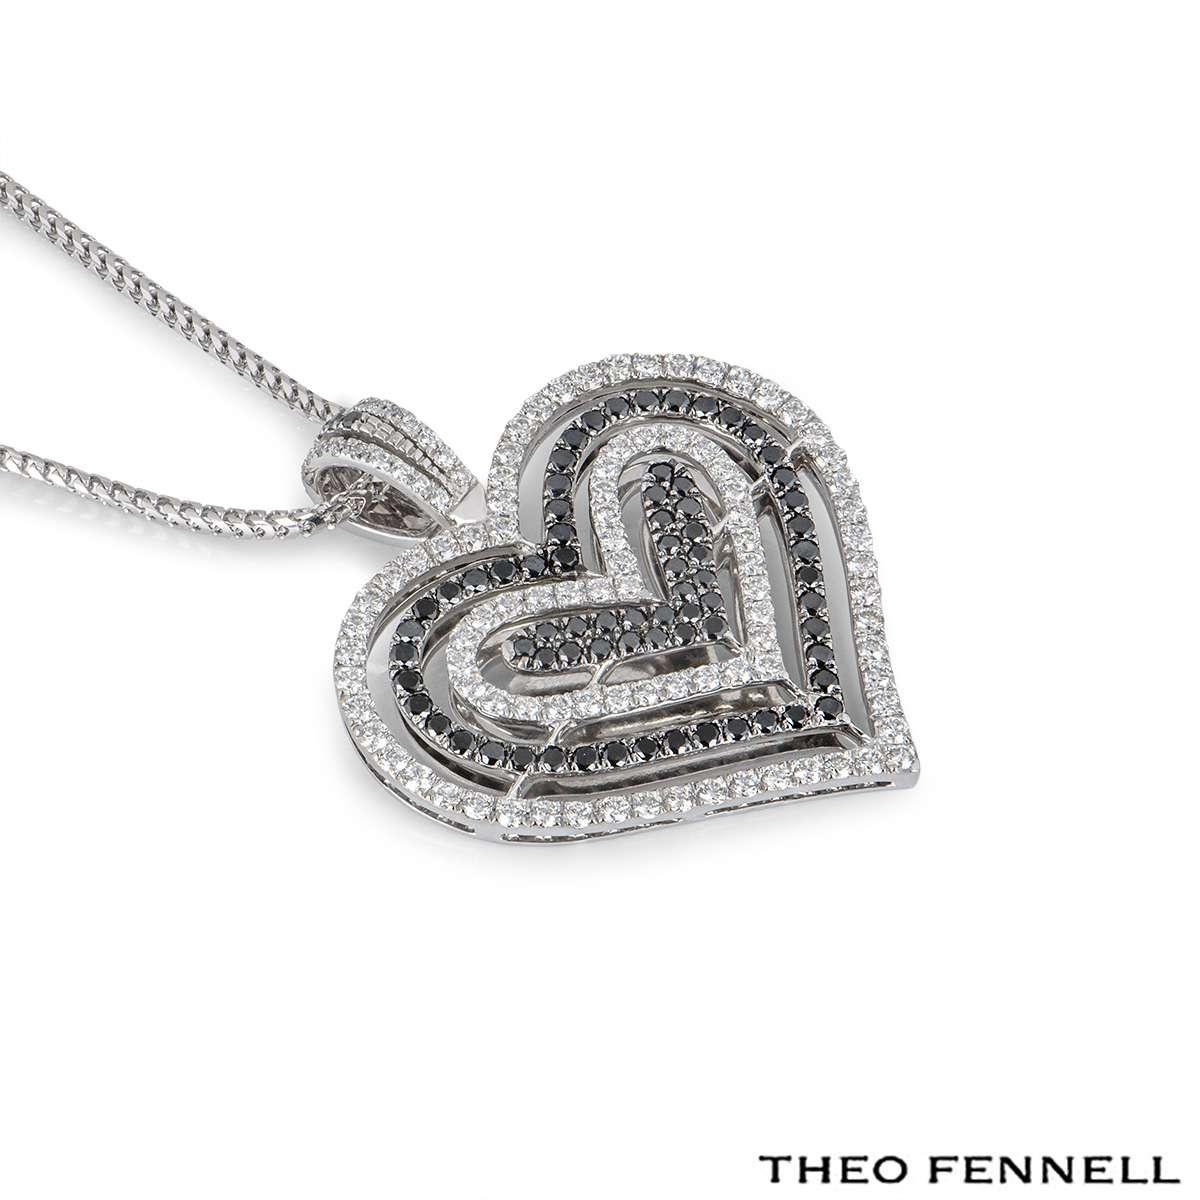 Theo Fennell White Gold Diamond Pendant